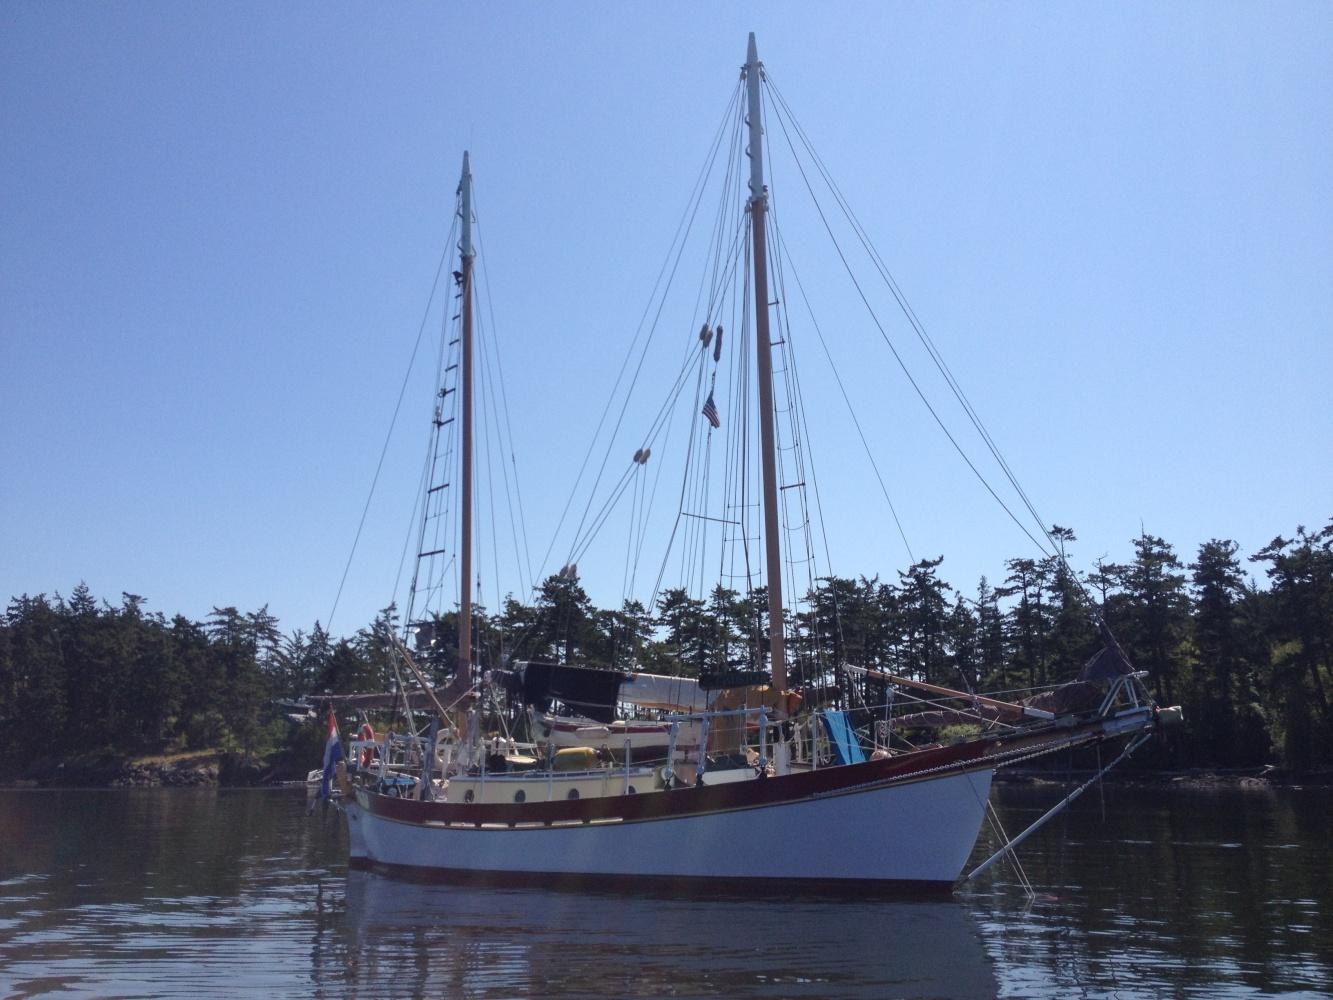 Click image for larger version  Name:San Juans Aug. 2012 206.jpg Views:99 Size:406.9 KB ID:45272